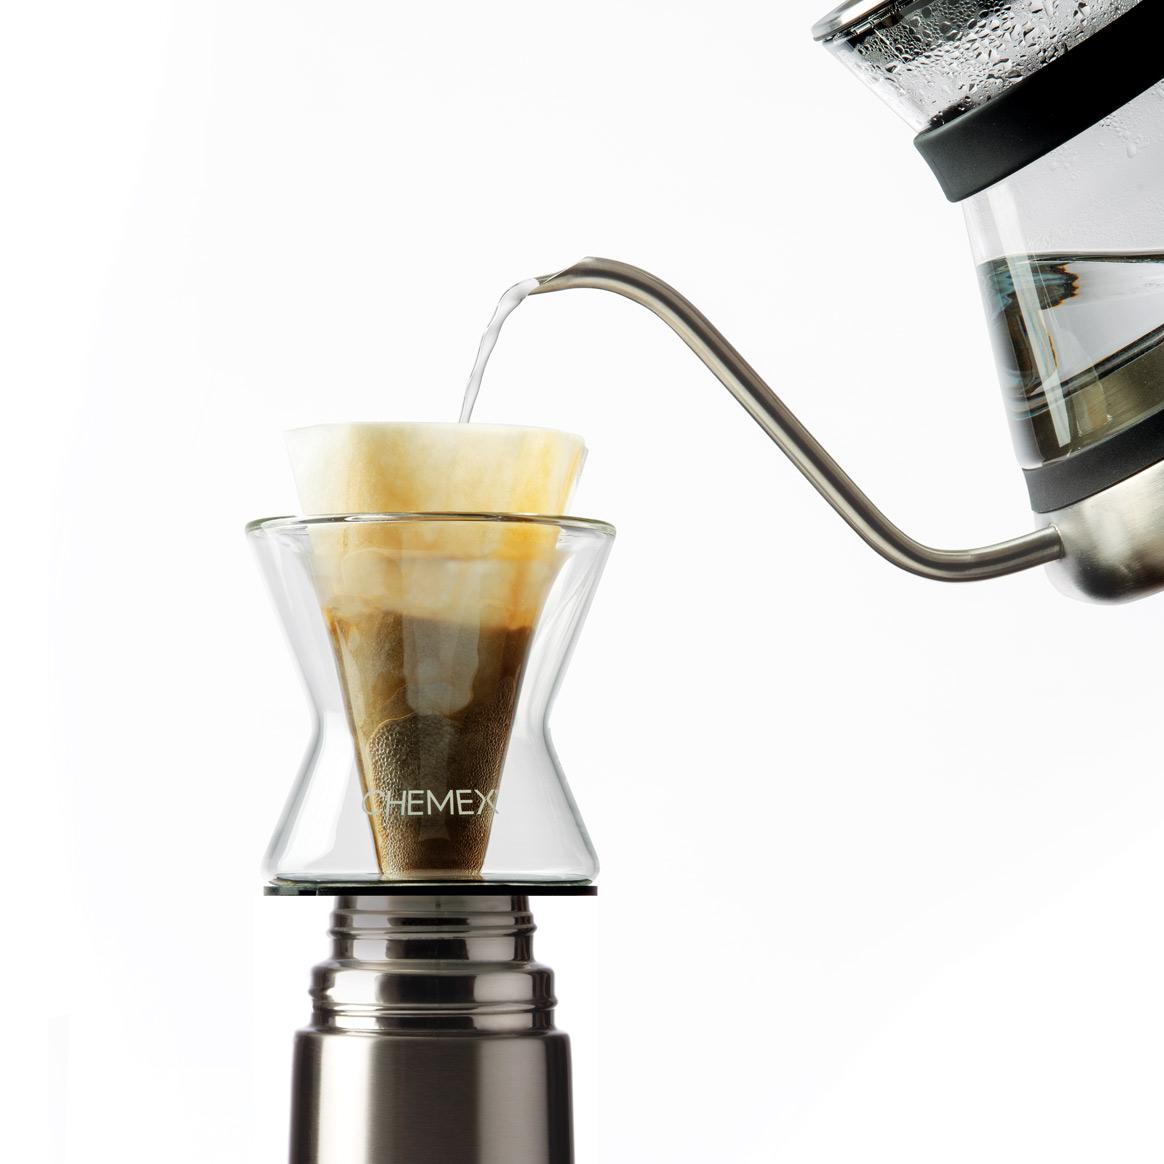 Chemex Funnex Pour Over Coffee Maker - CM-FNX